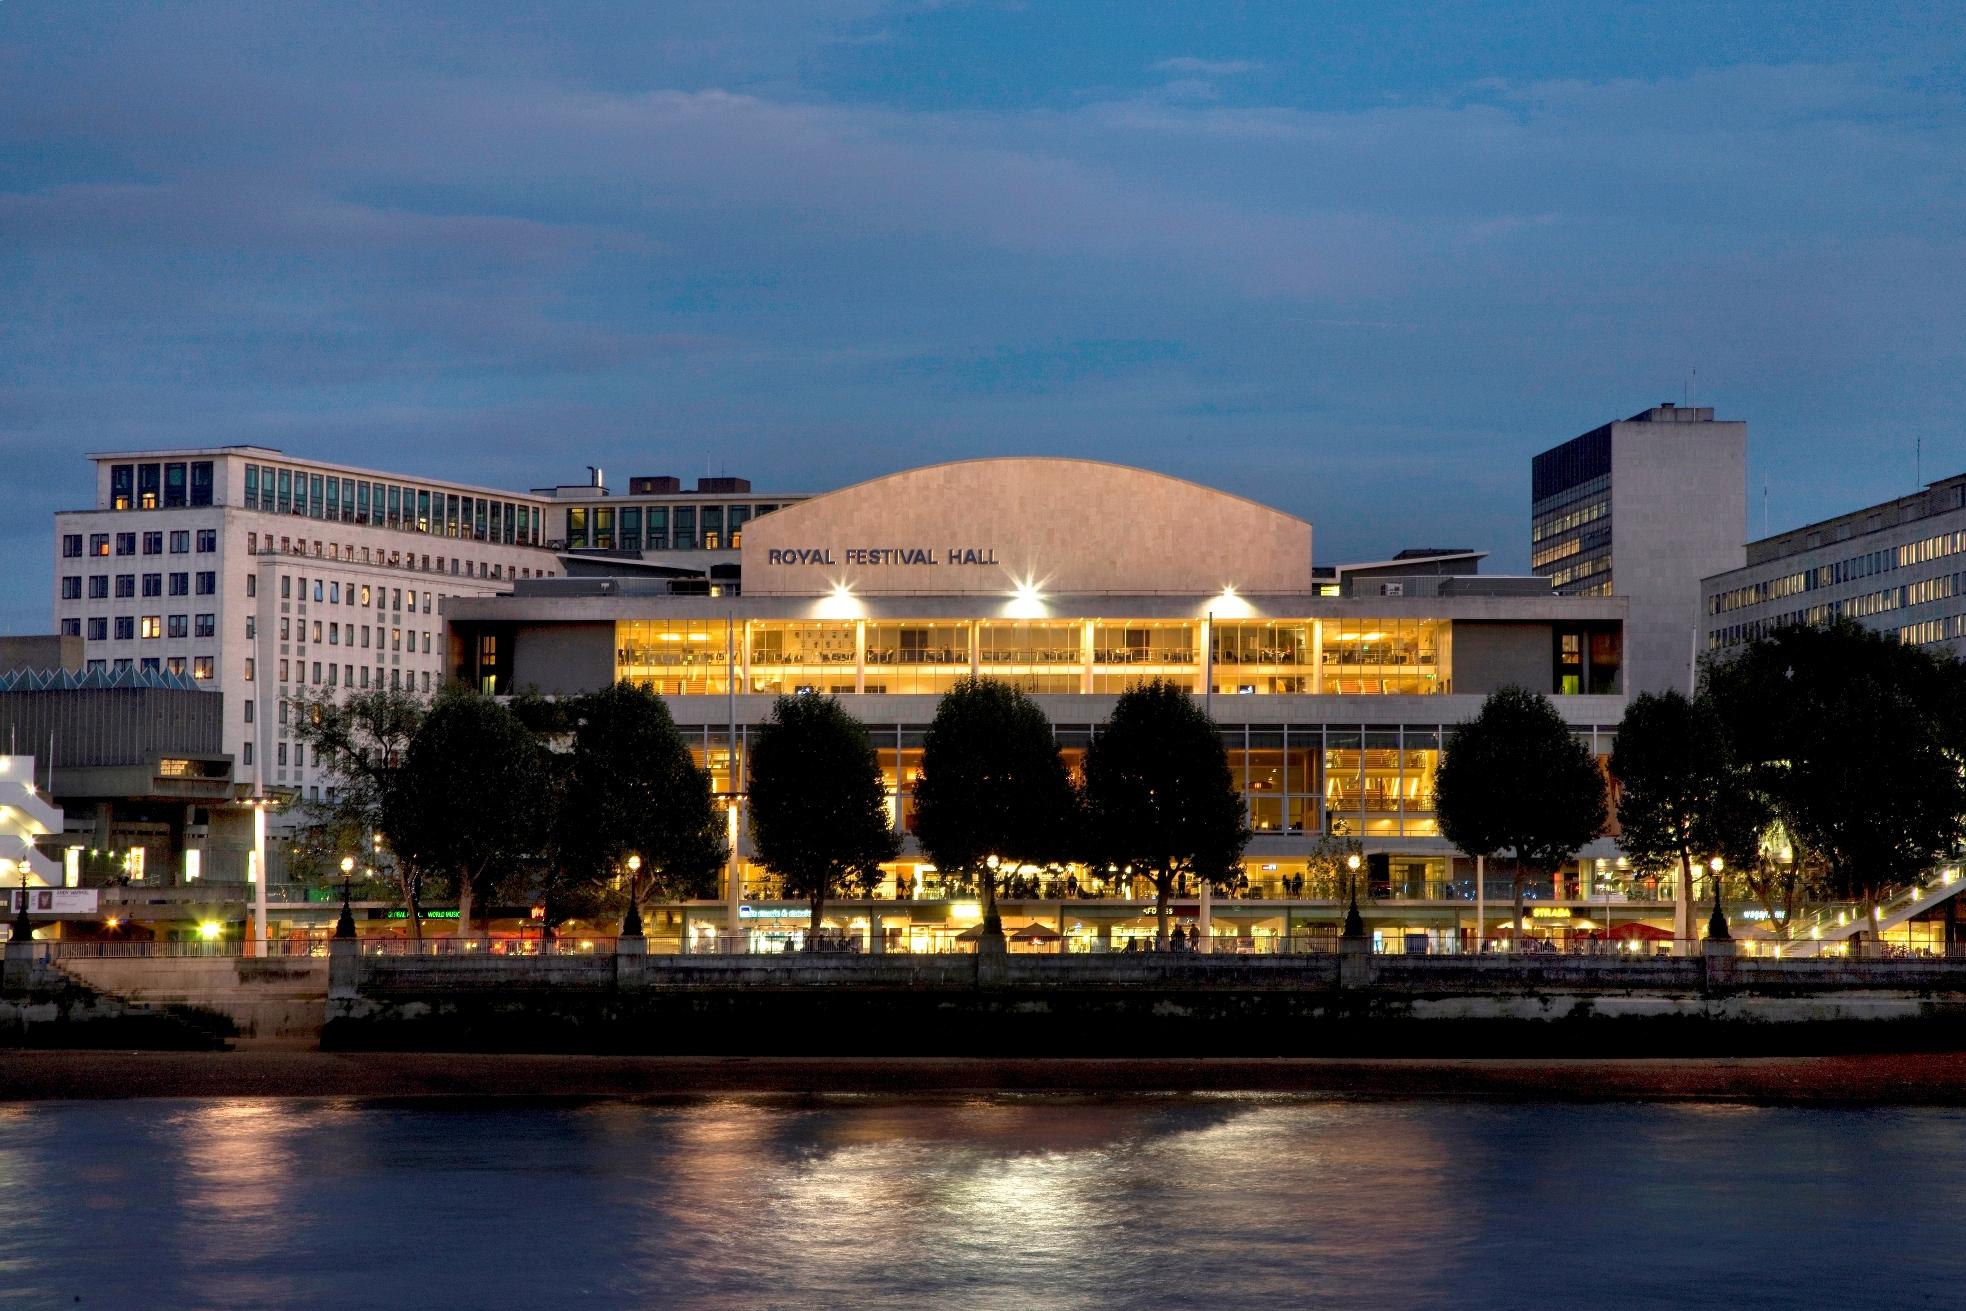 Royal Festival Hall accross Thames. Copyright Morley von Sternberg